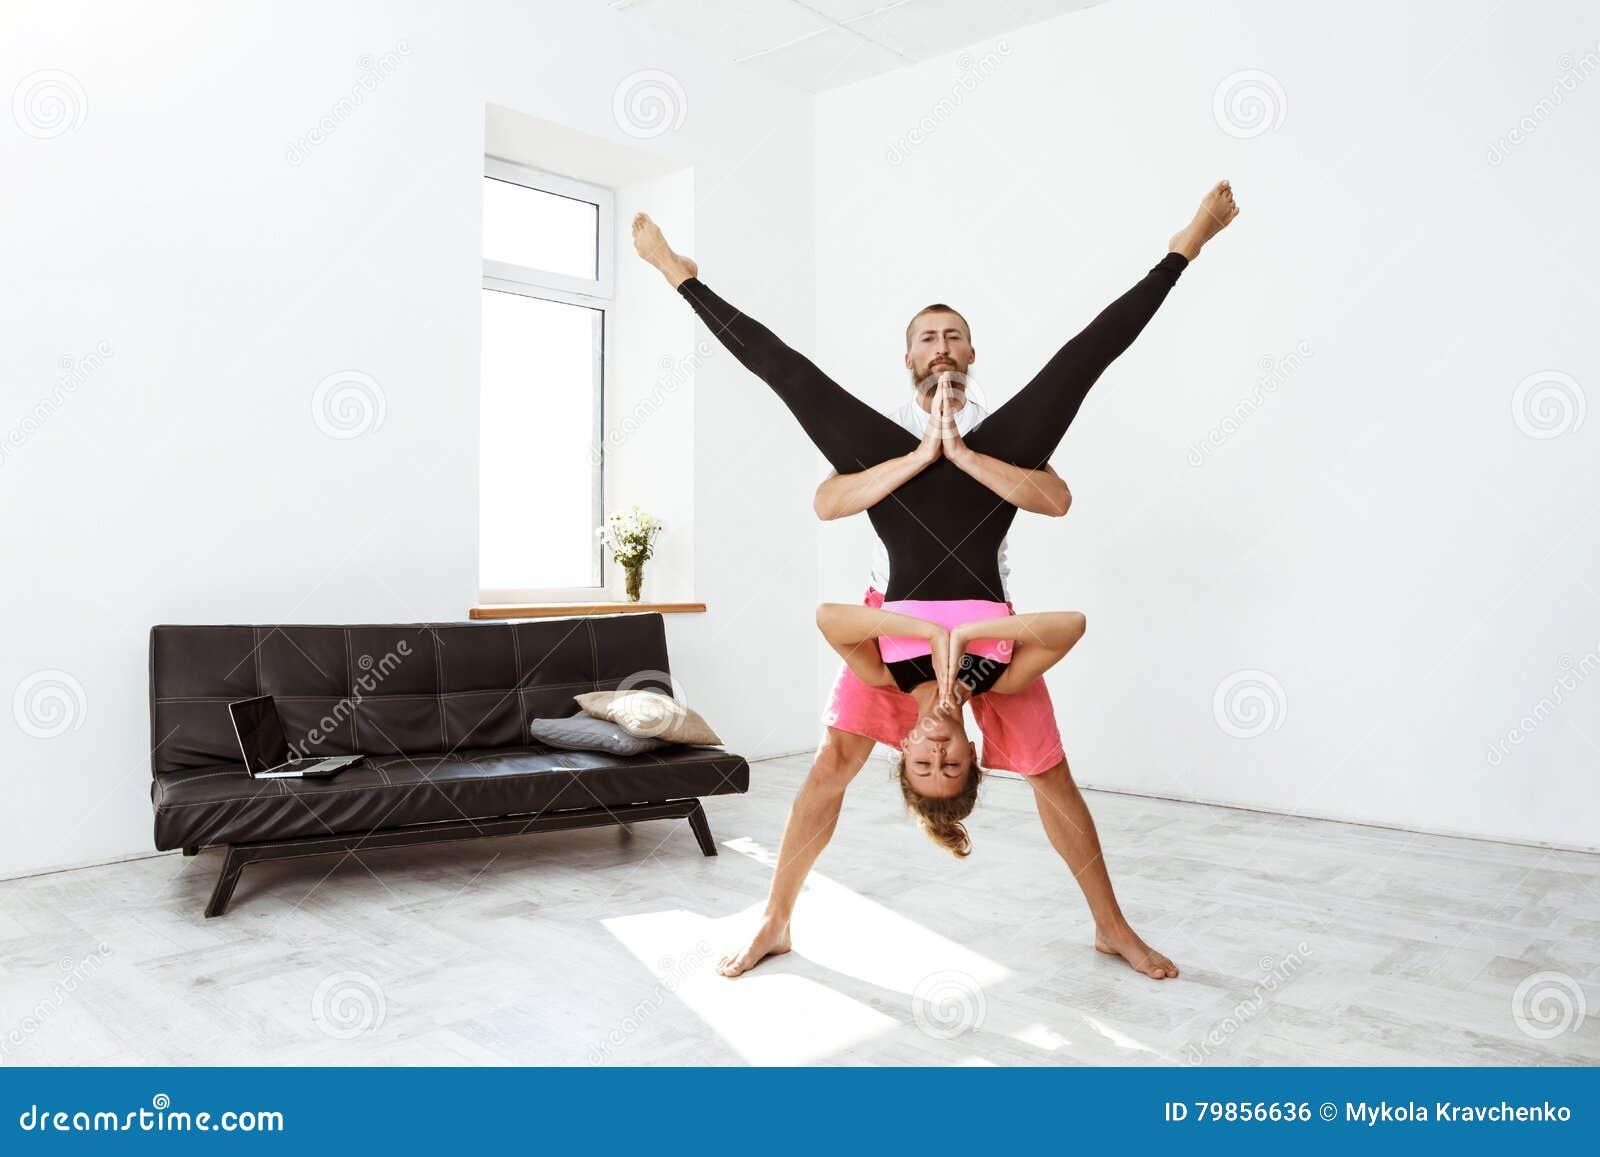 Young Beautiful Sportive Couple Practicing Partner Yoga Asanas At Home Stock Photo Image Of Female Joyful 79856636